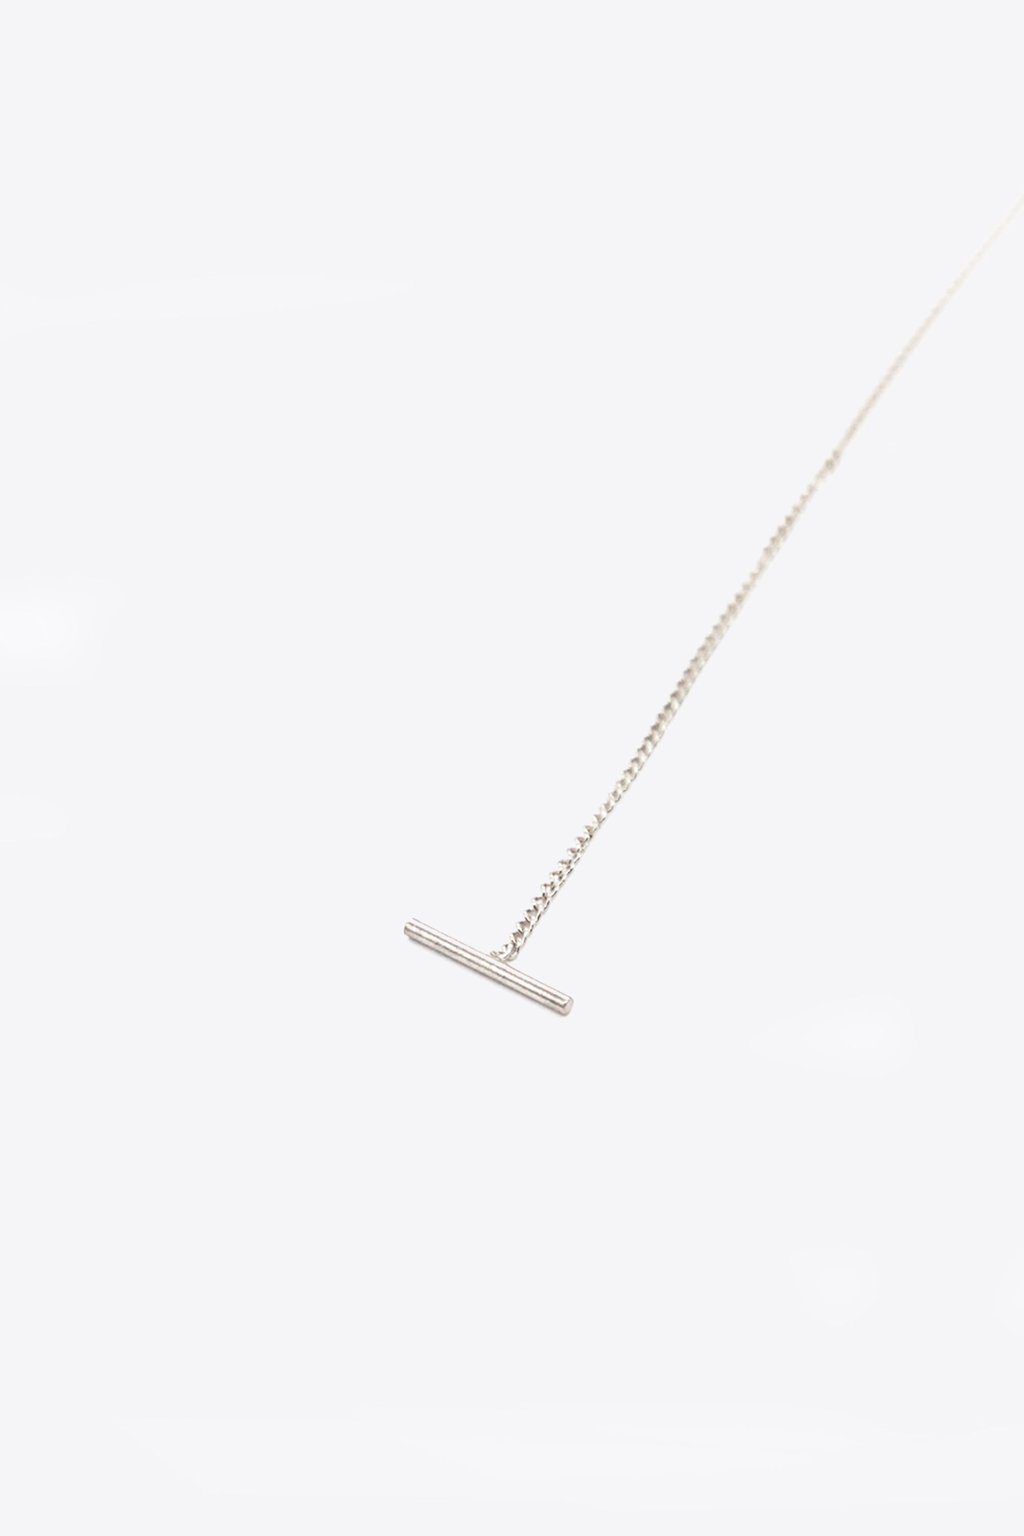 Necklace 1785 Silver 4